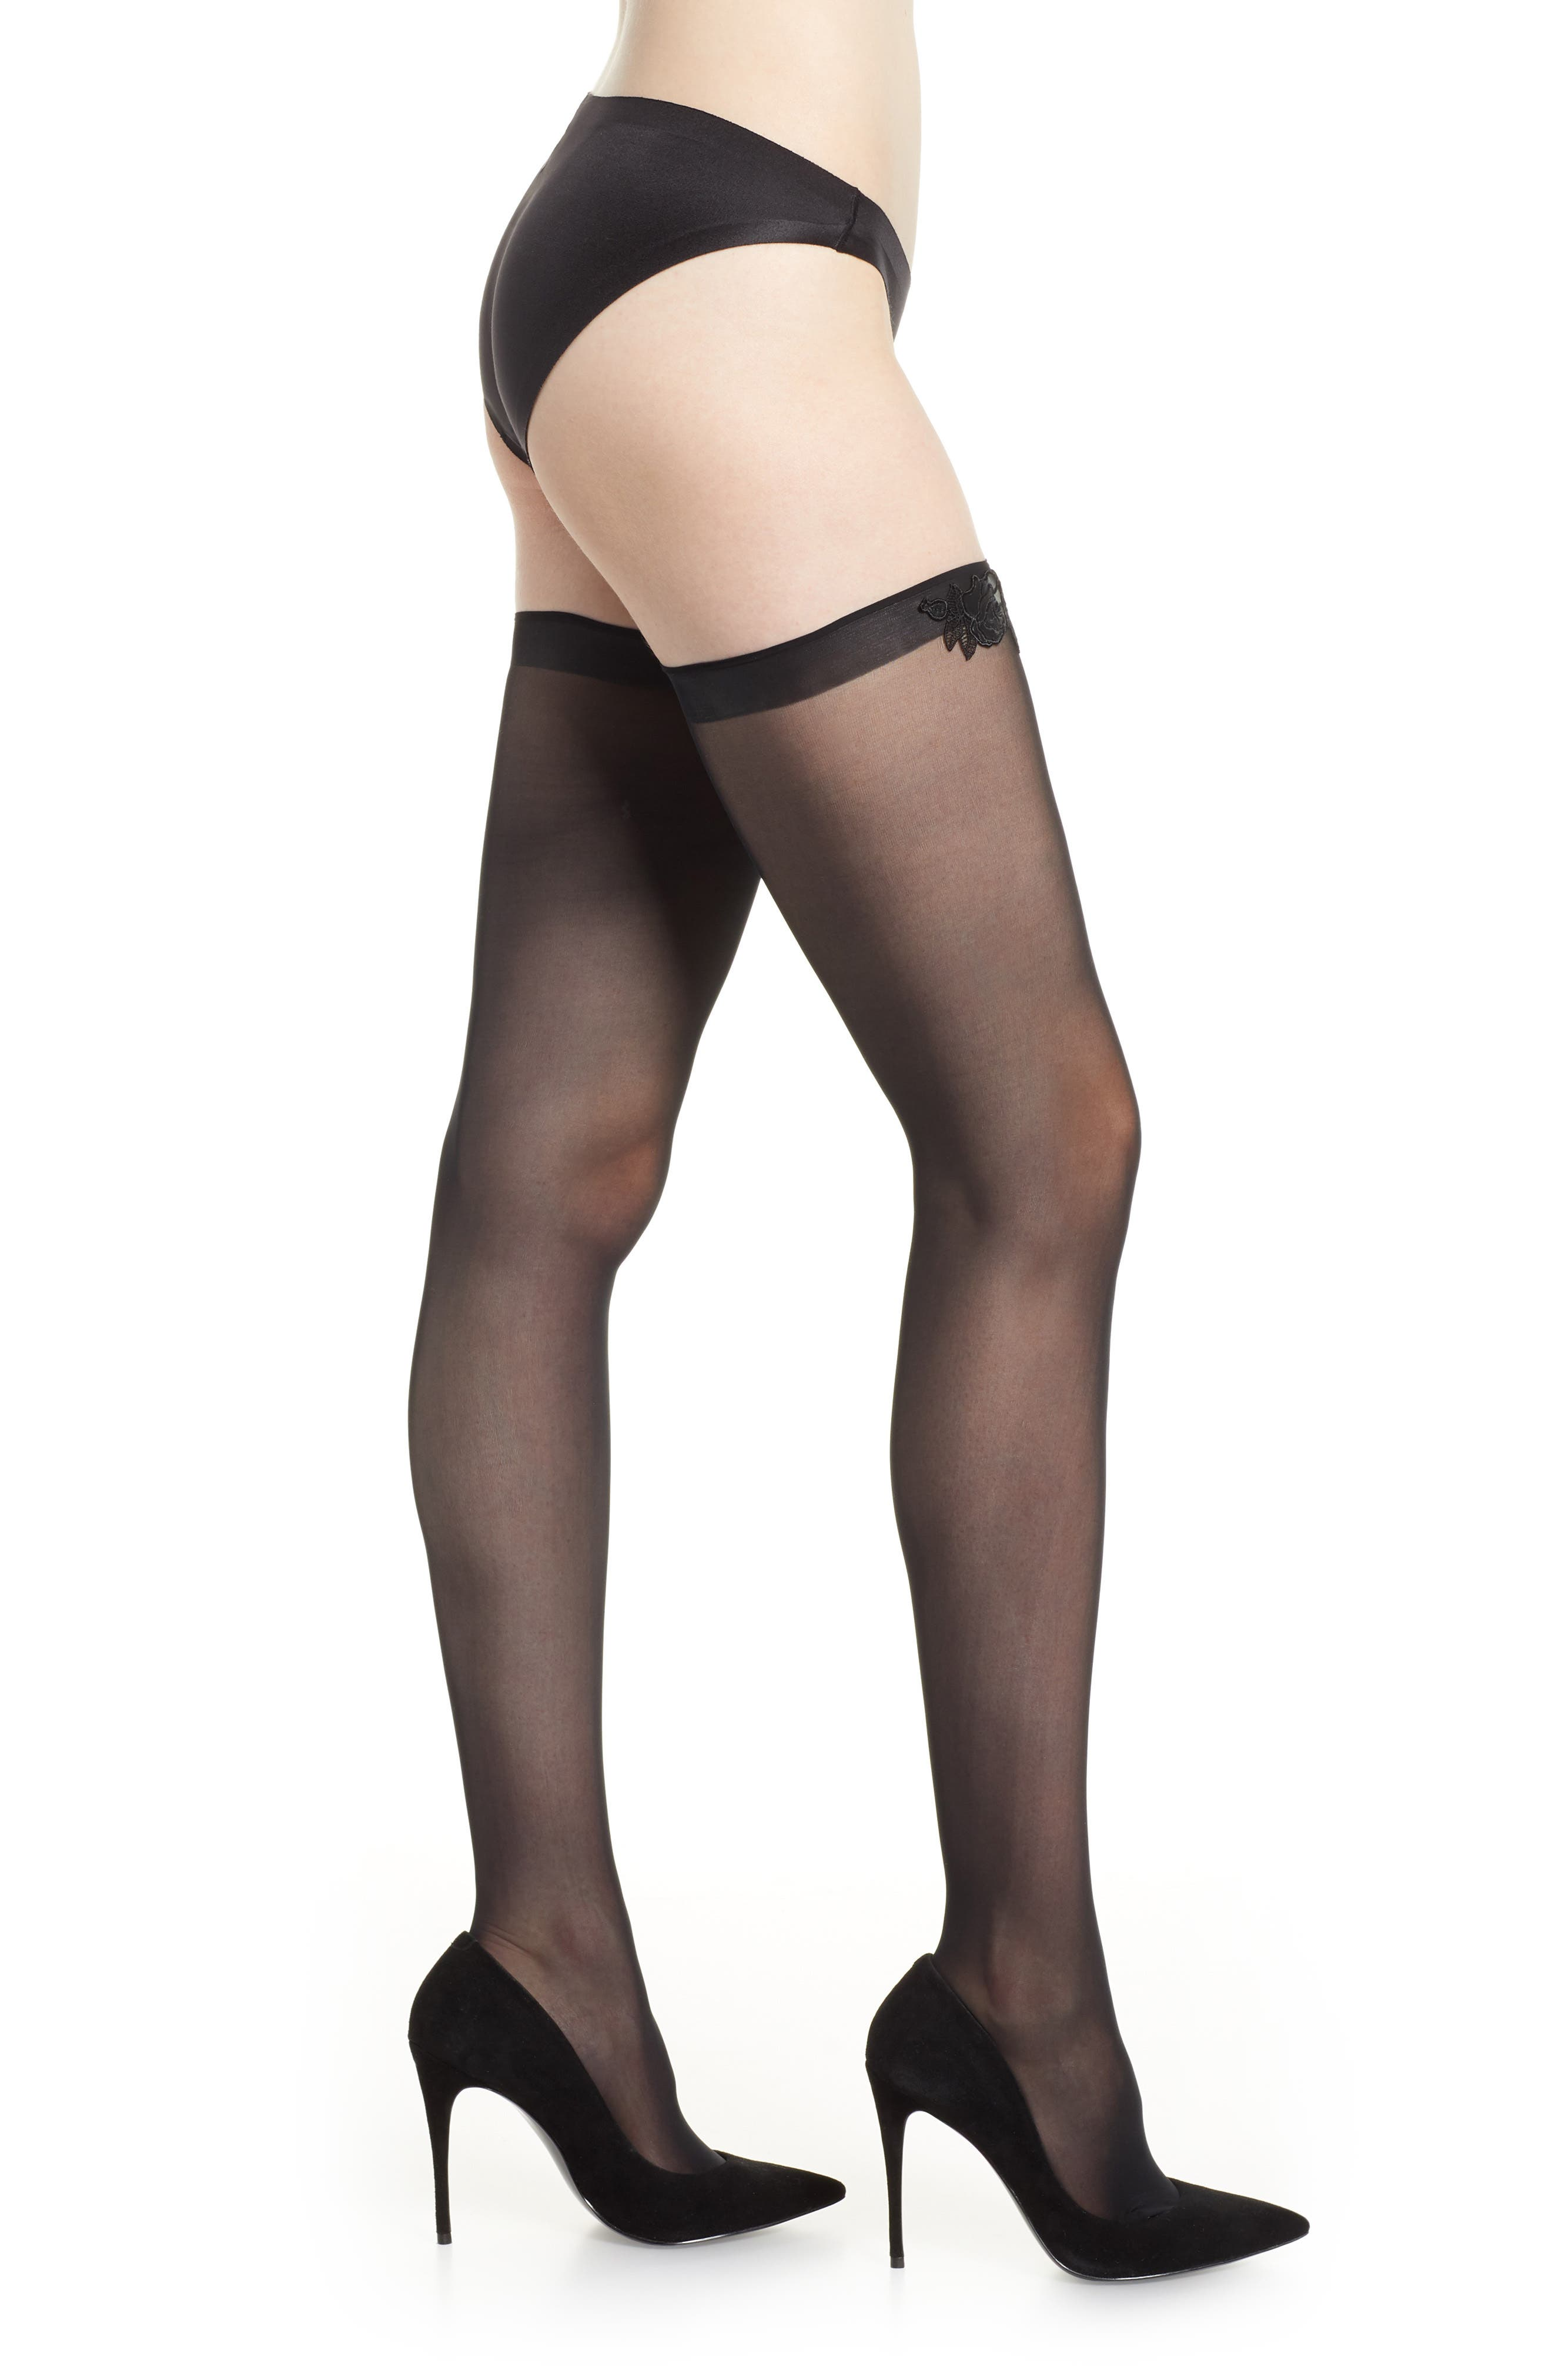 Valentina Stay-Up Stockings,                             Main thumbnail 1, color,                             BLACK